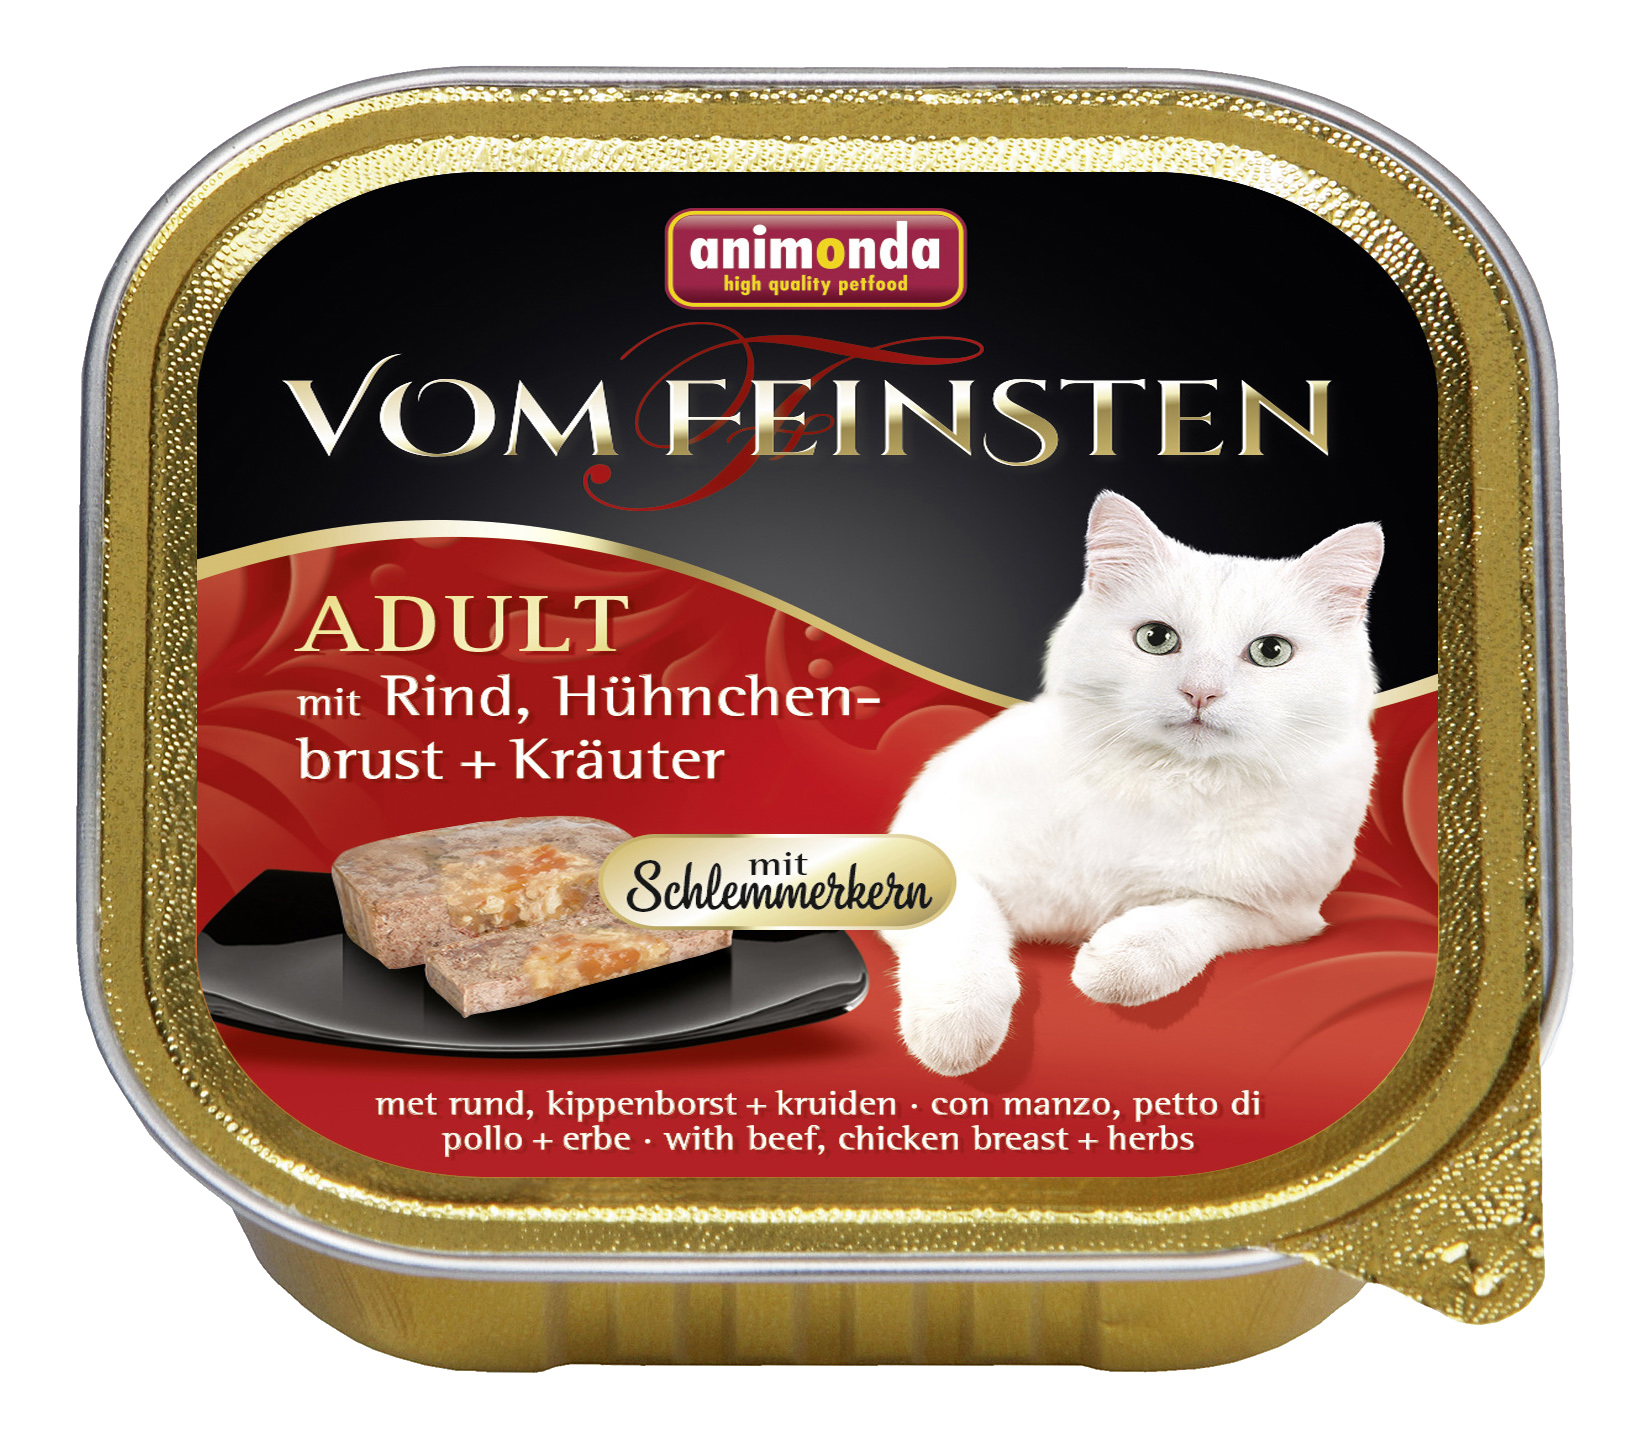 Консервы для кошек Animonda Vom Feinsten Adult, говядина, курица, овощи, 100г фото